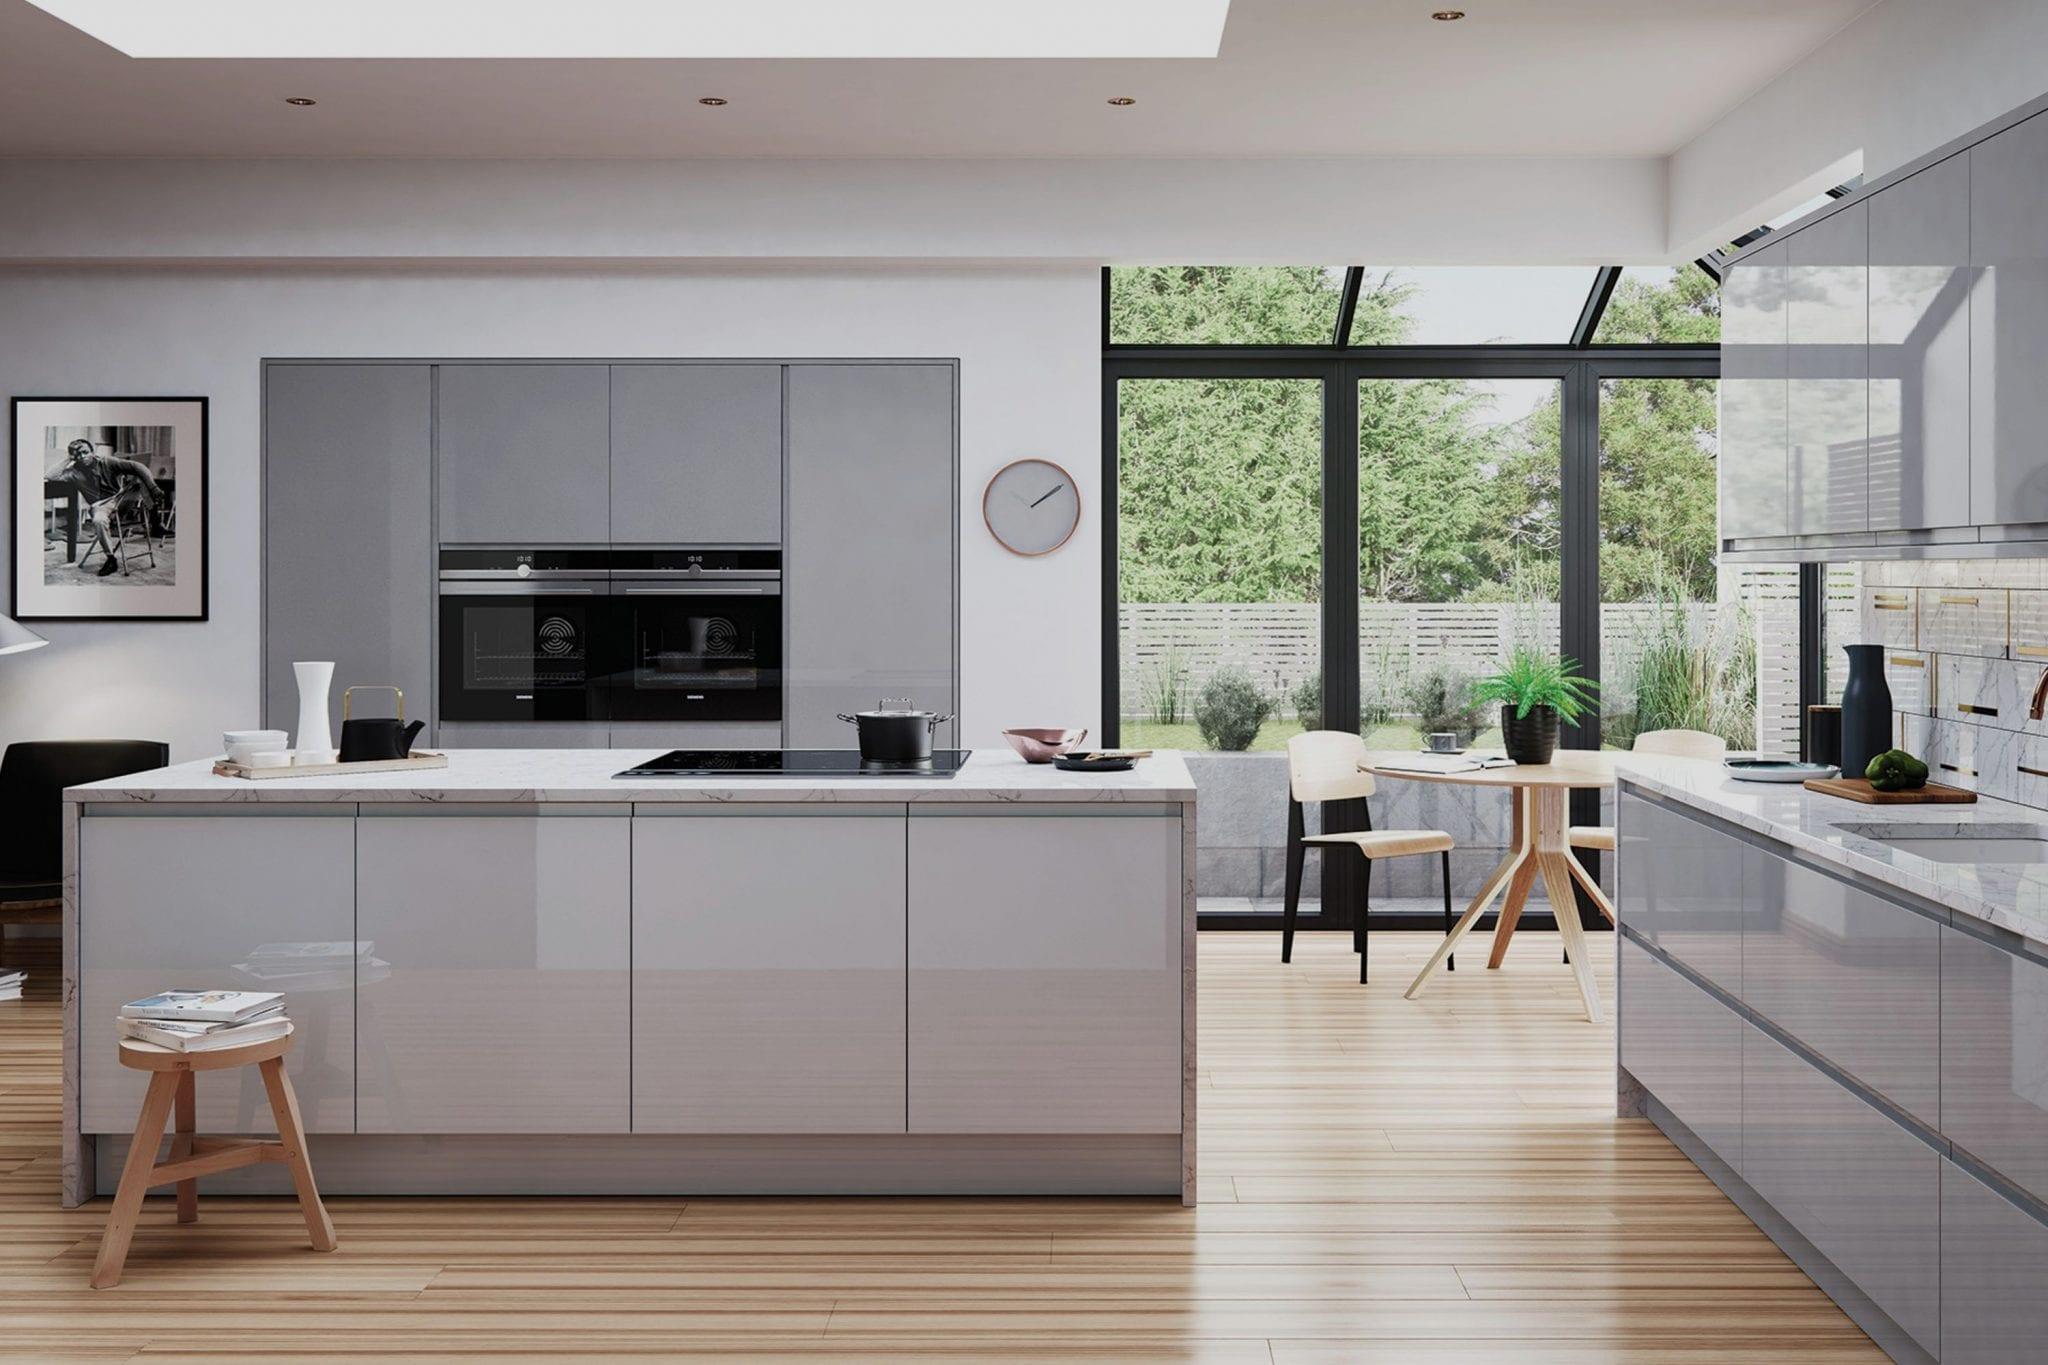 Flo -Ream Interiors Kitchen